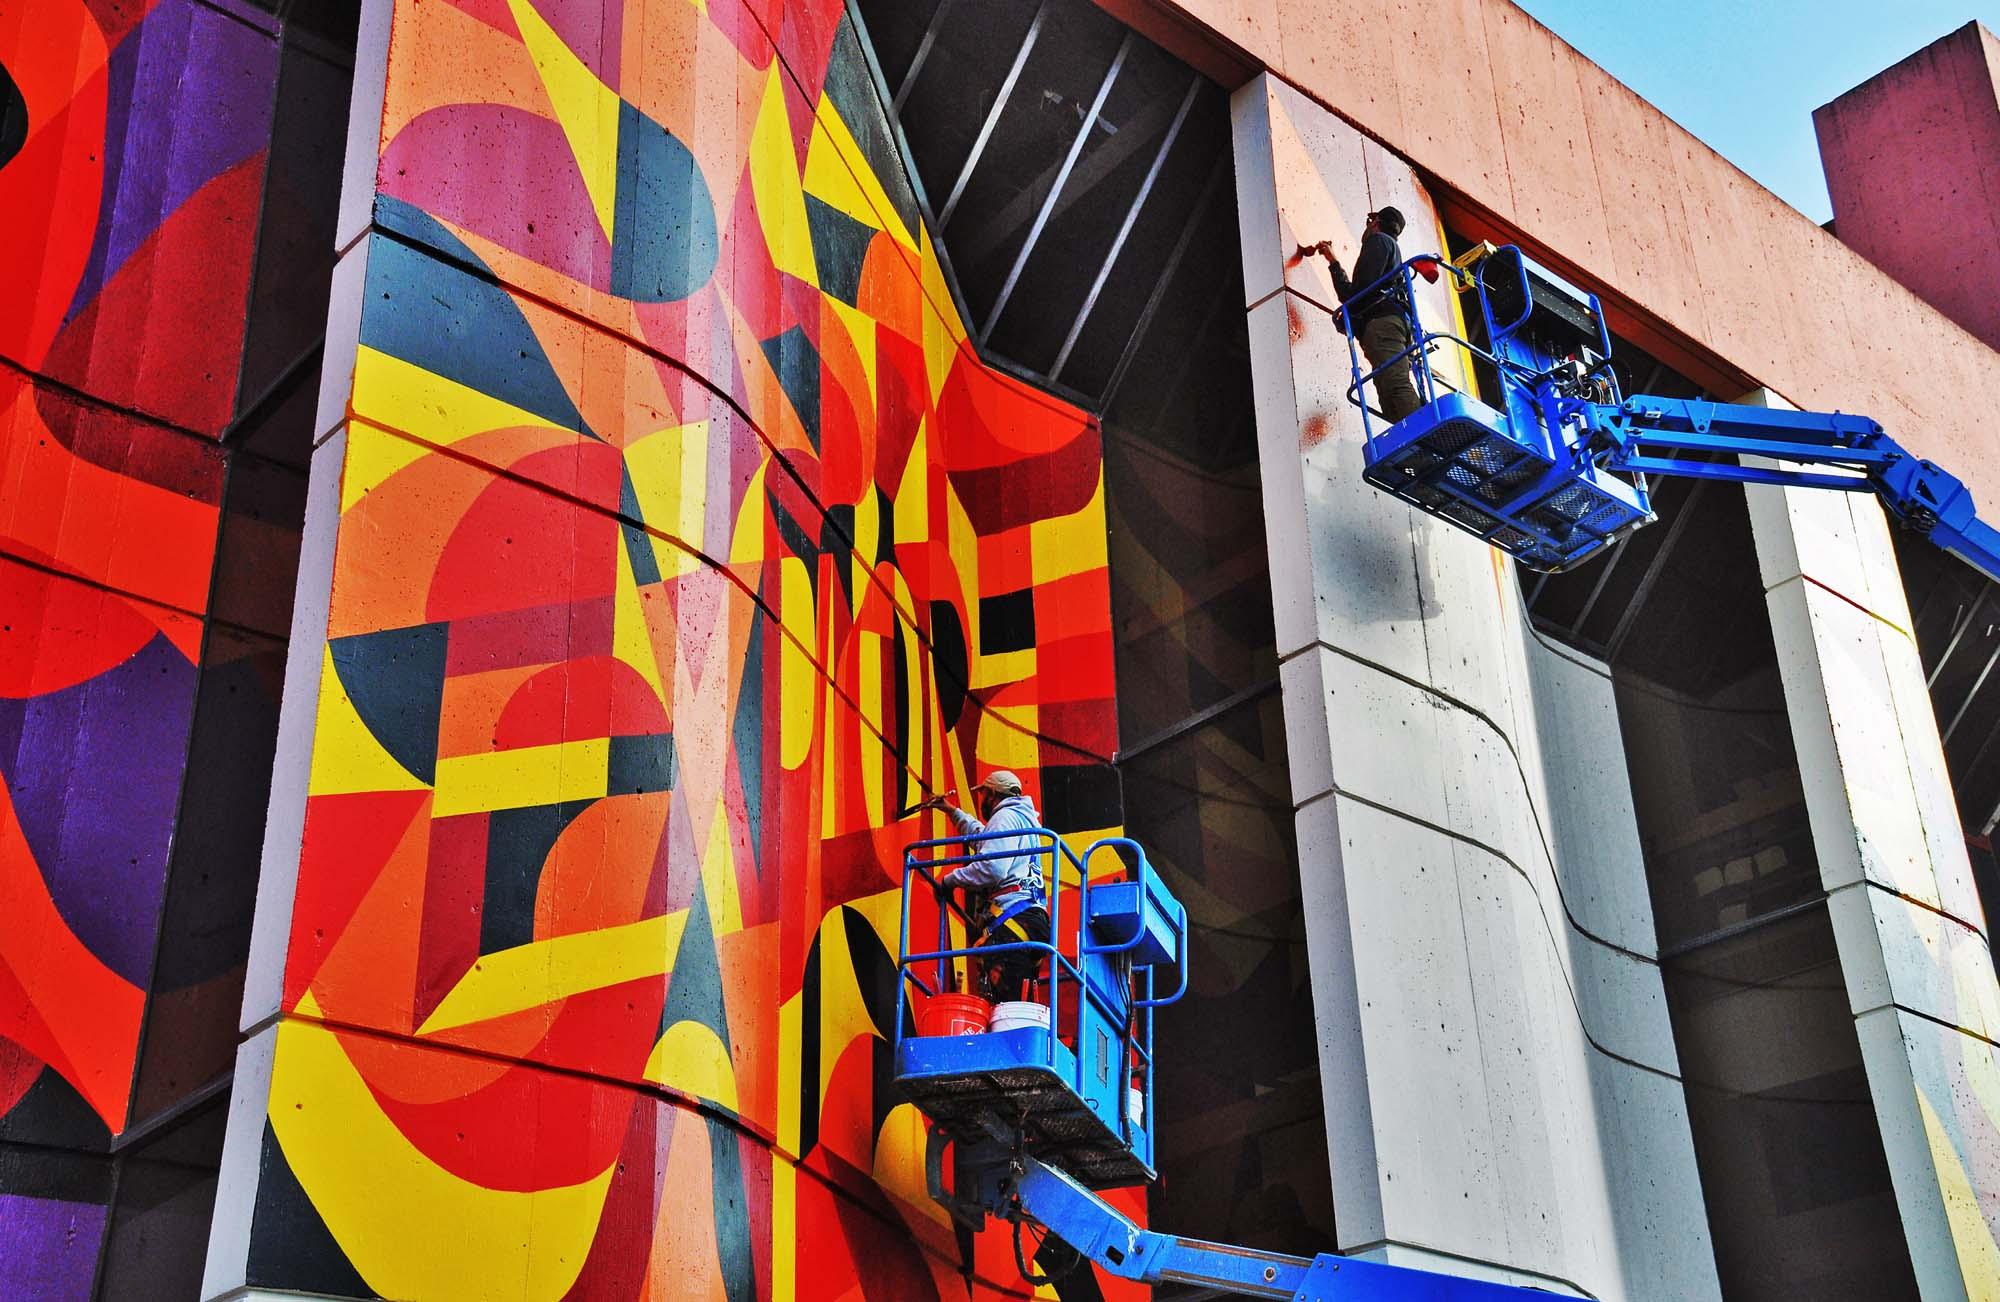 Graffiti Artists work on Large Scale Public Art